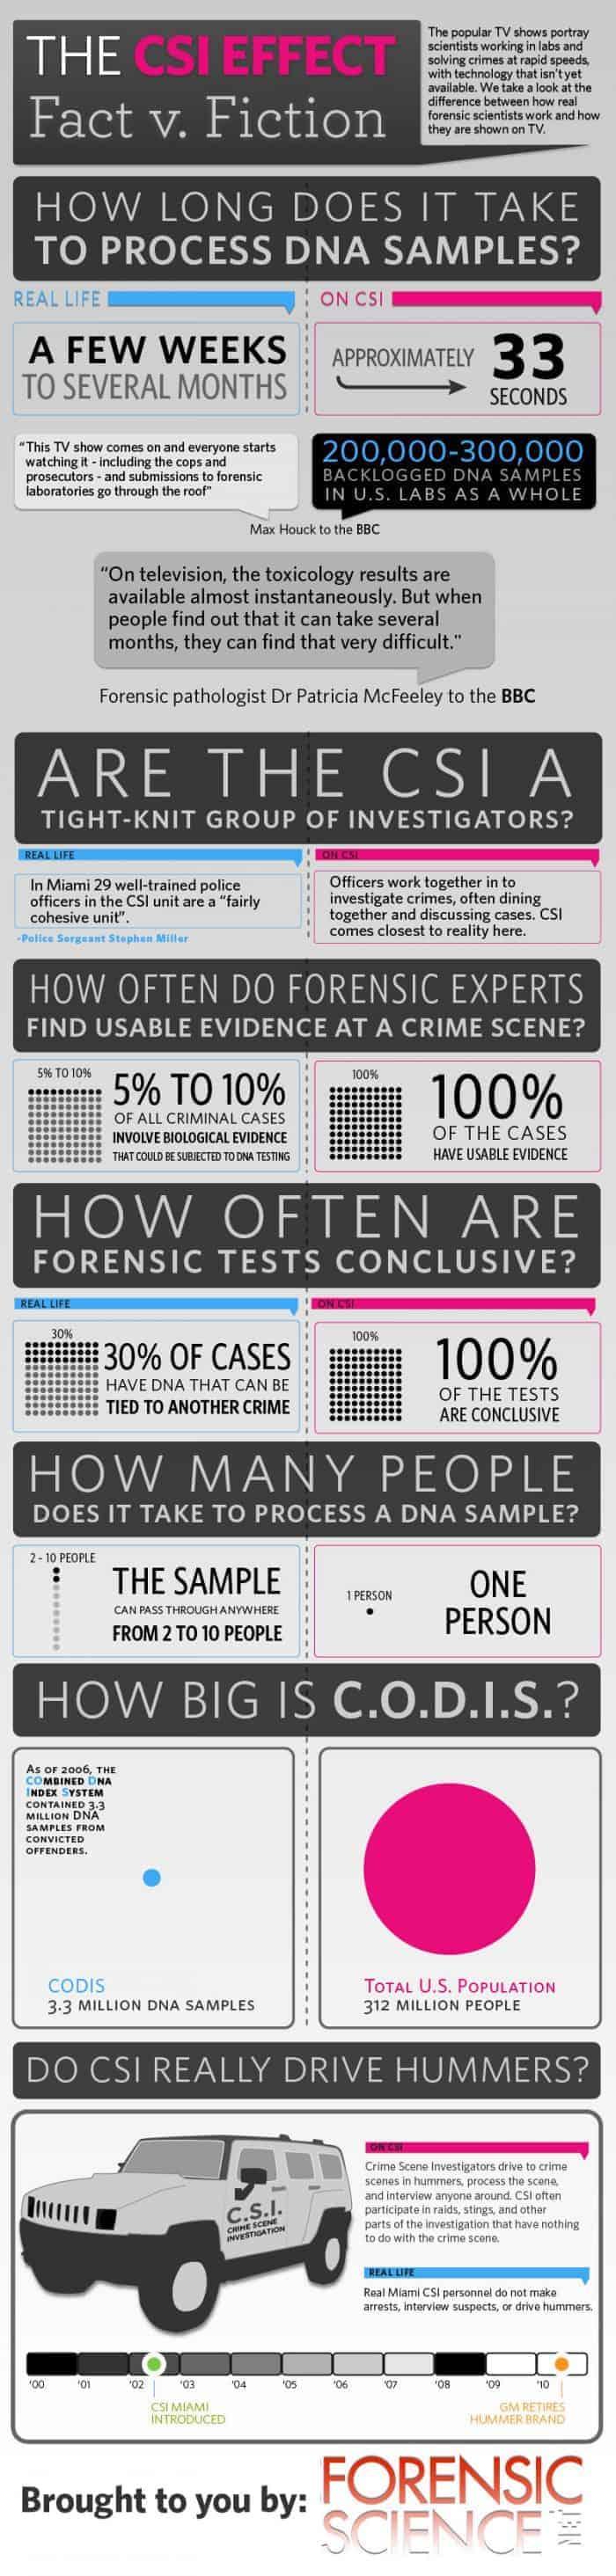 Csi Effect Fact V. Fiction